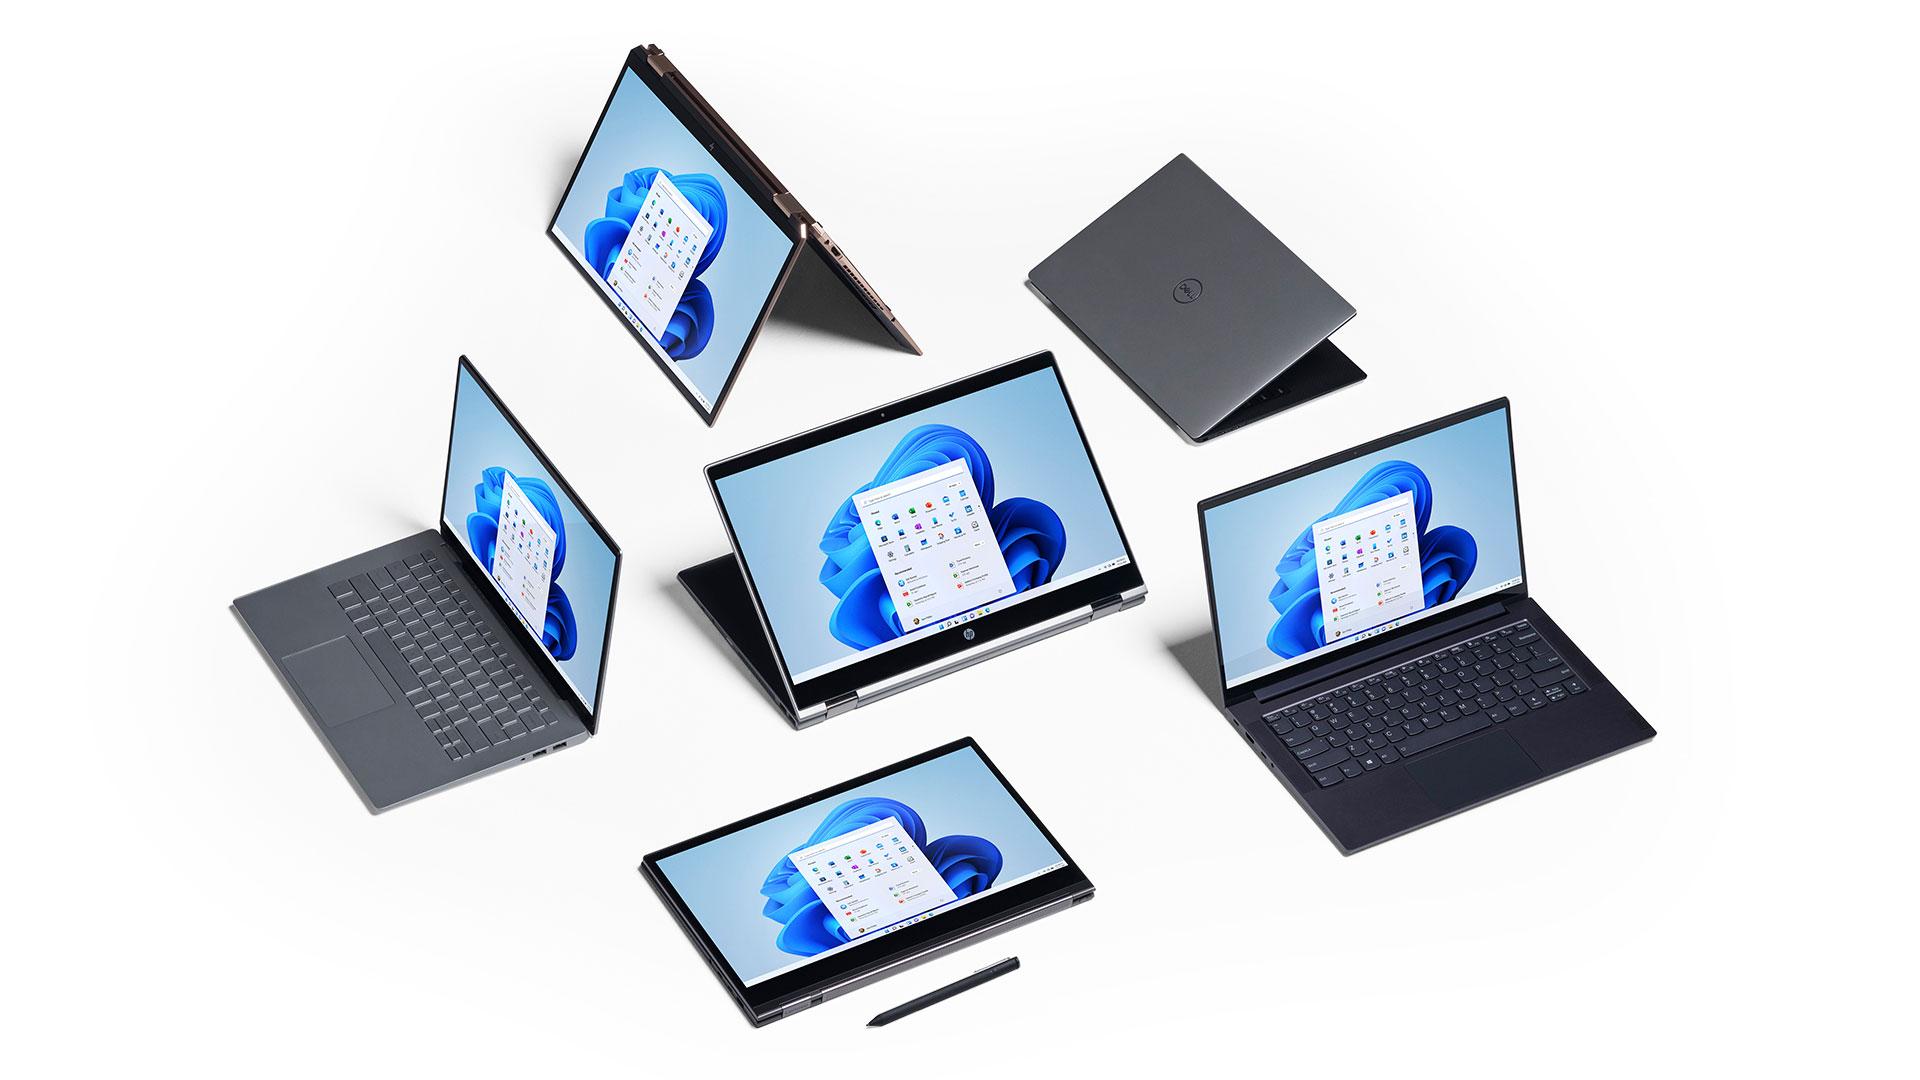 Sex stycken uppställda Windows 11-datorer